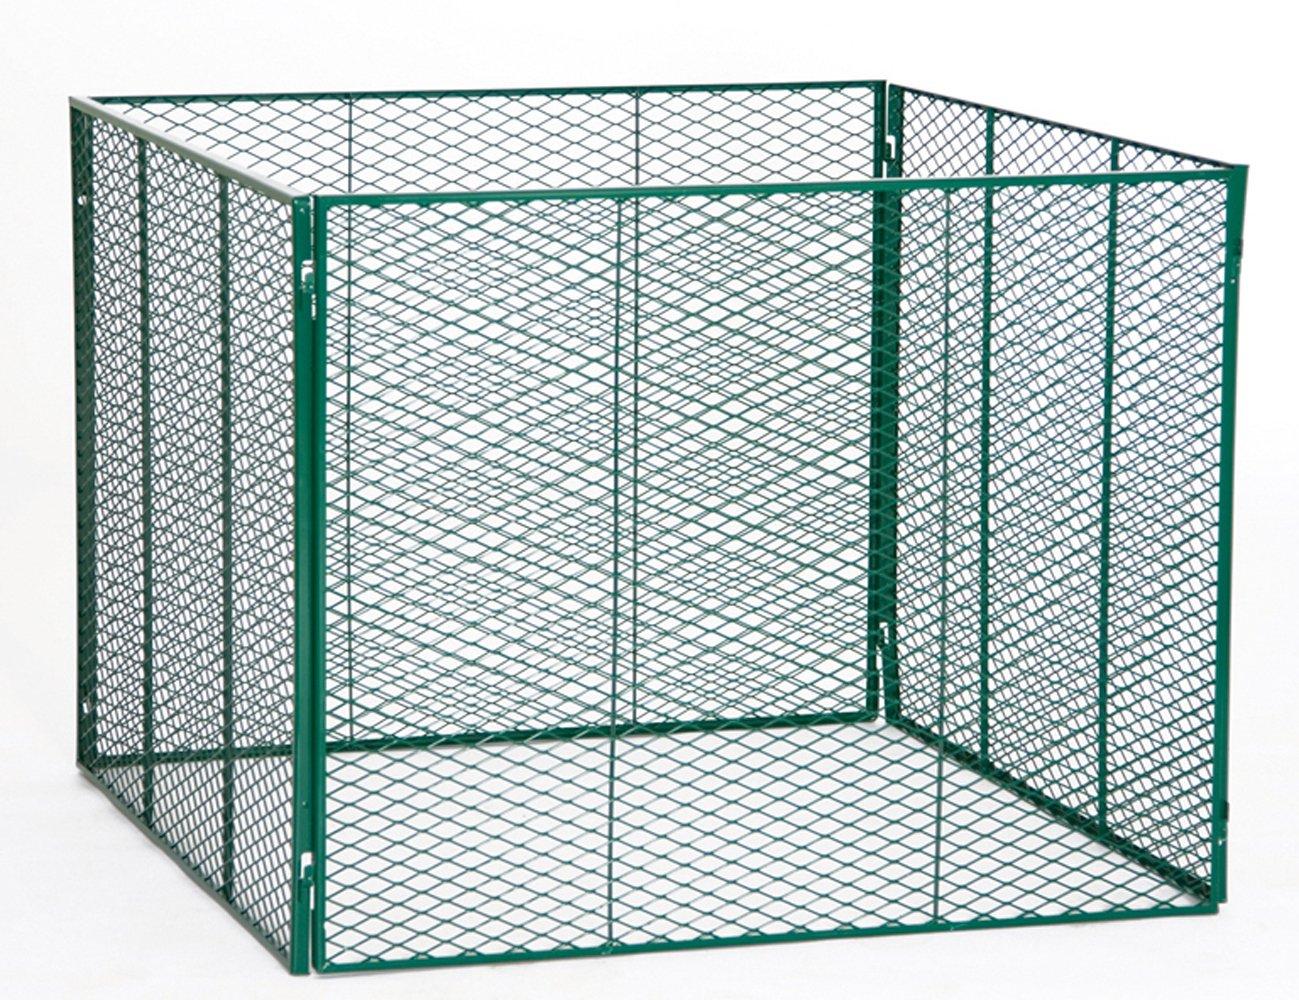 Streckmetall Richtig Anbringen brinkmann brista komposter verzinkt ral 6005 beschichet amazon de